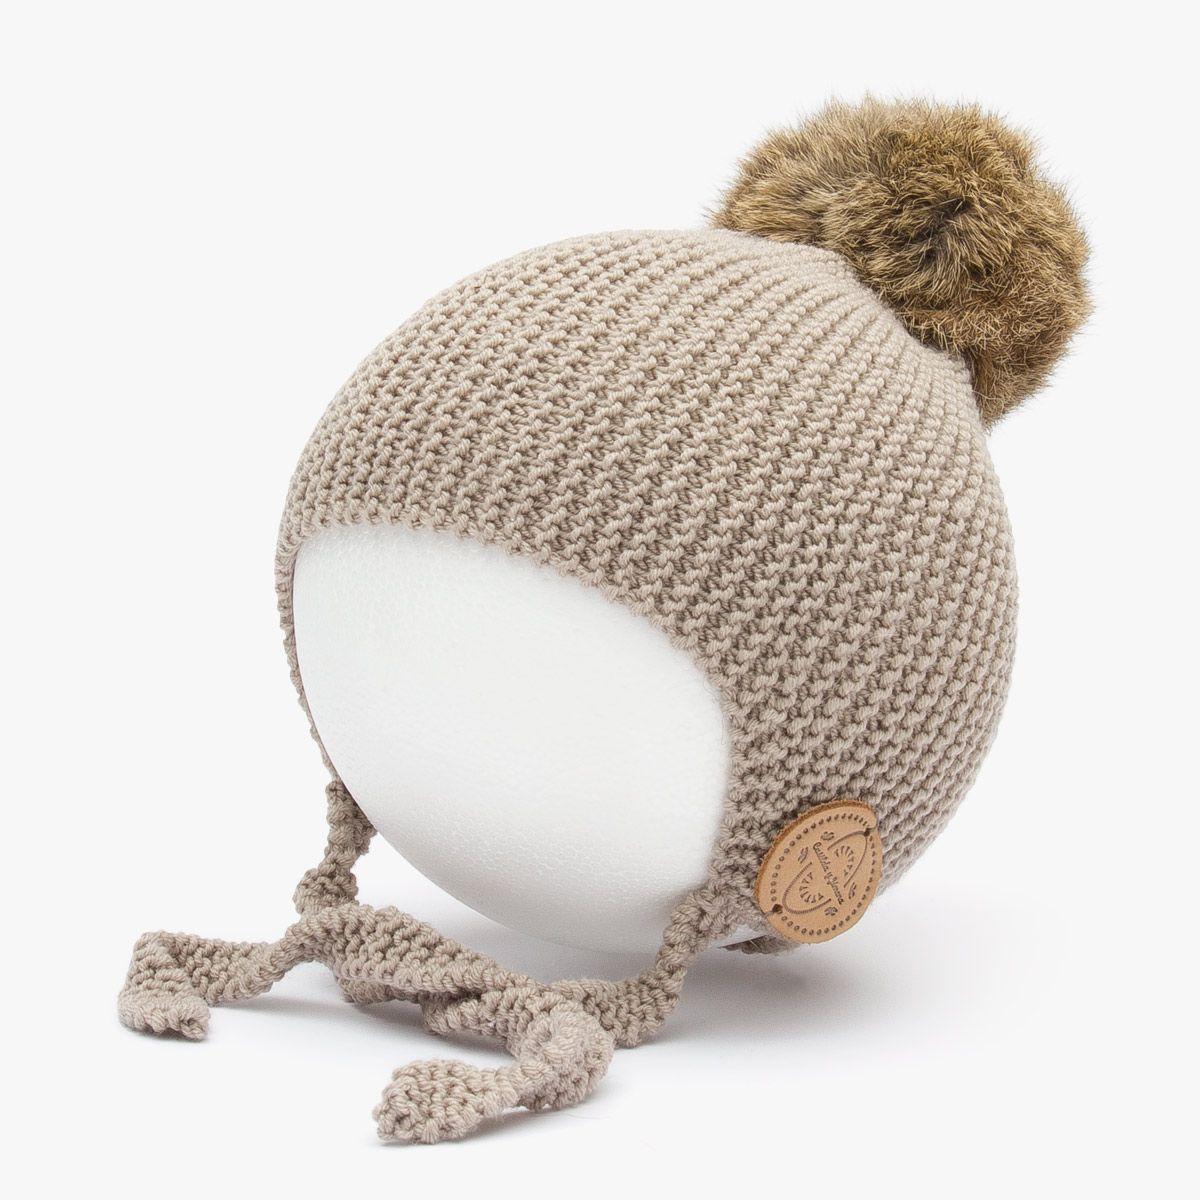 Gorro aviador | Casilda y Jimena | Baby girl knits | Pinterest ...